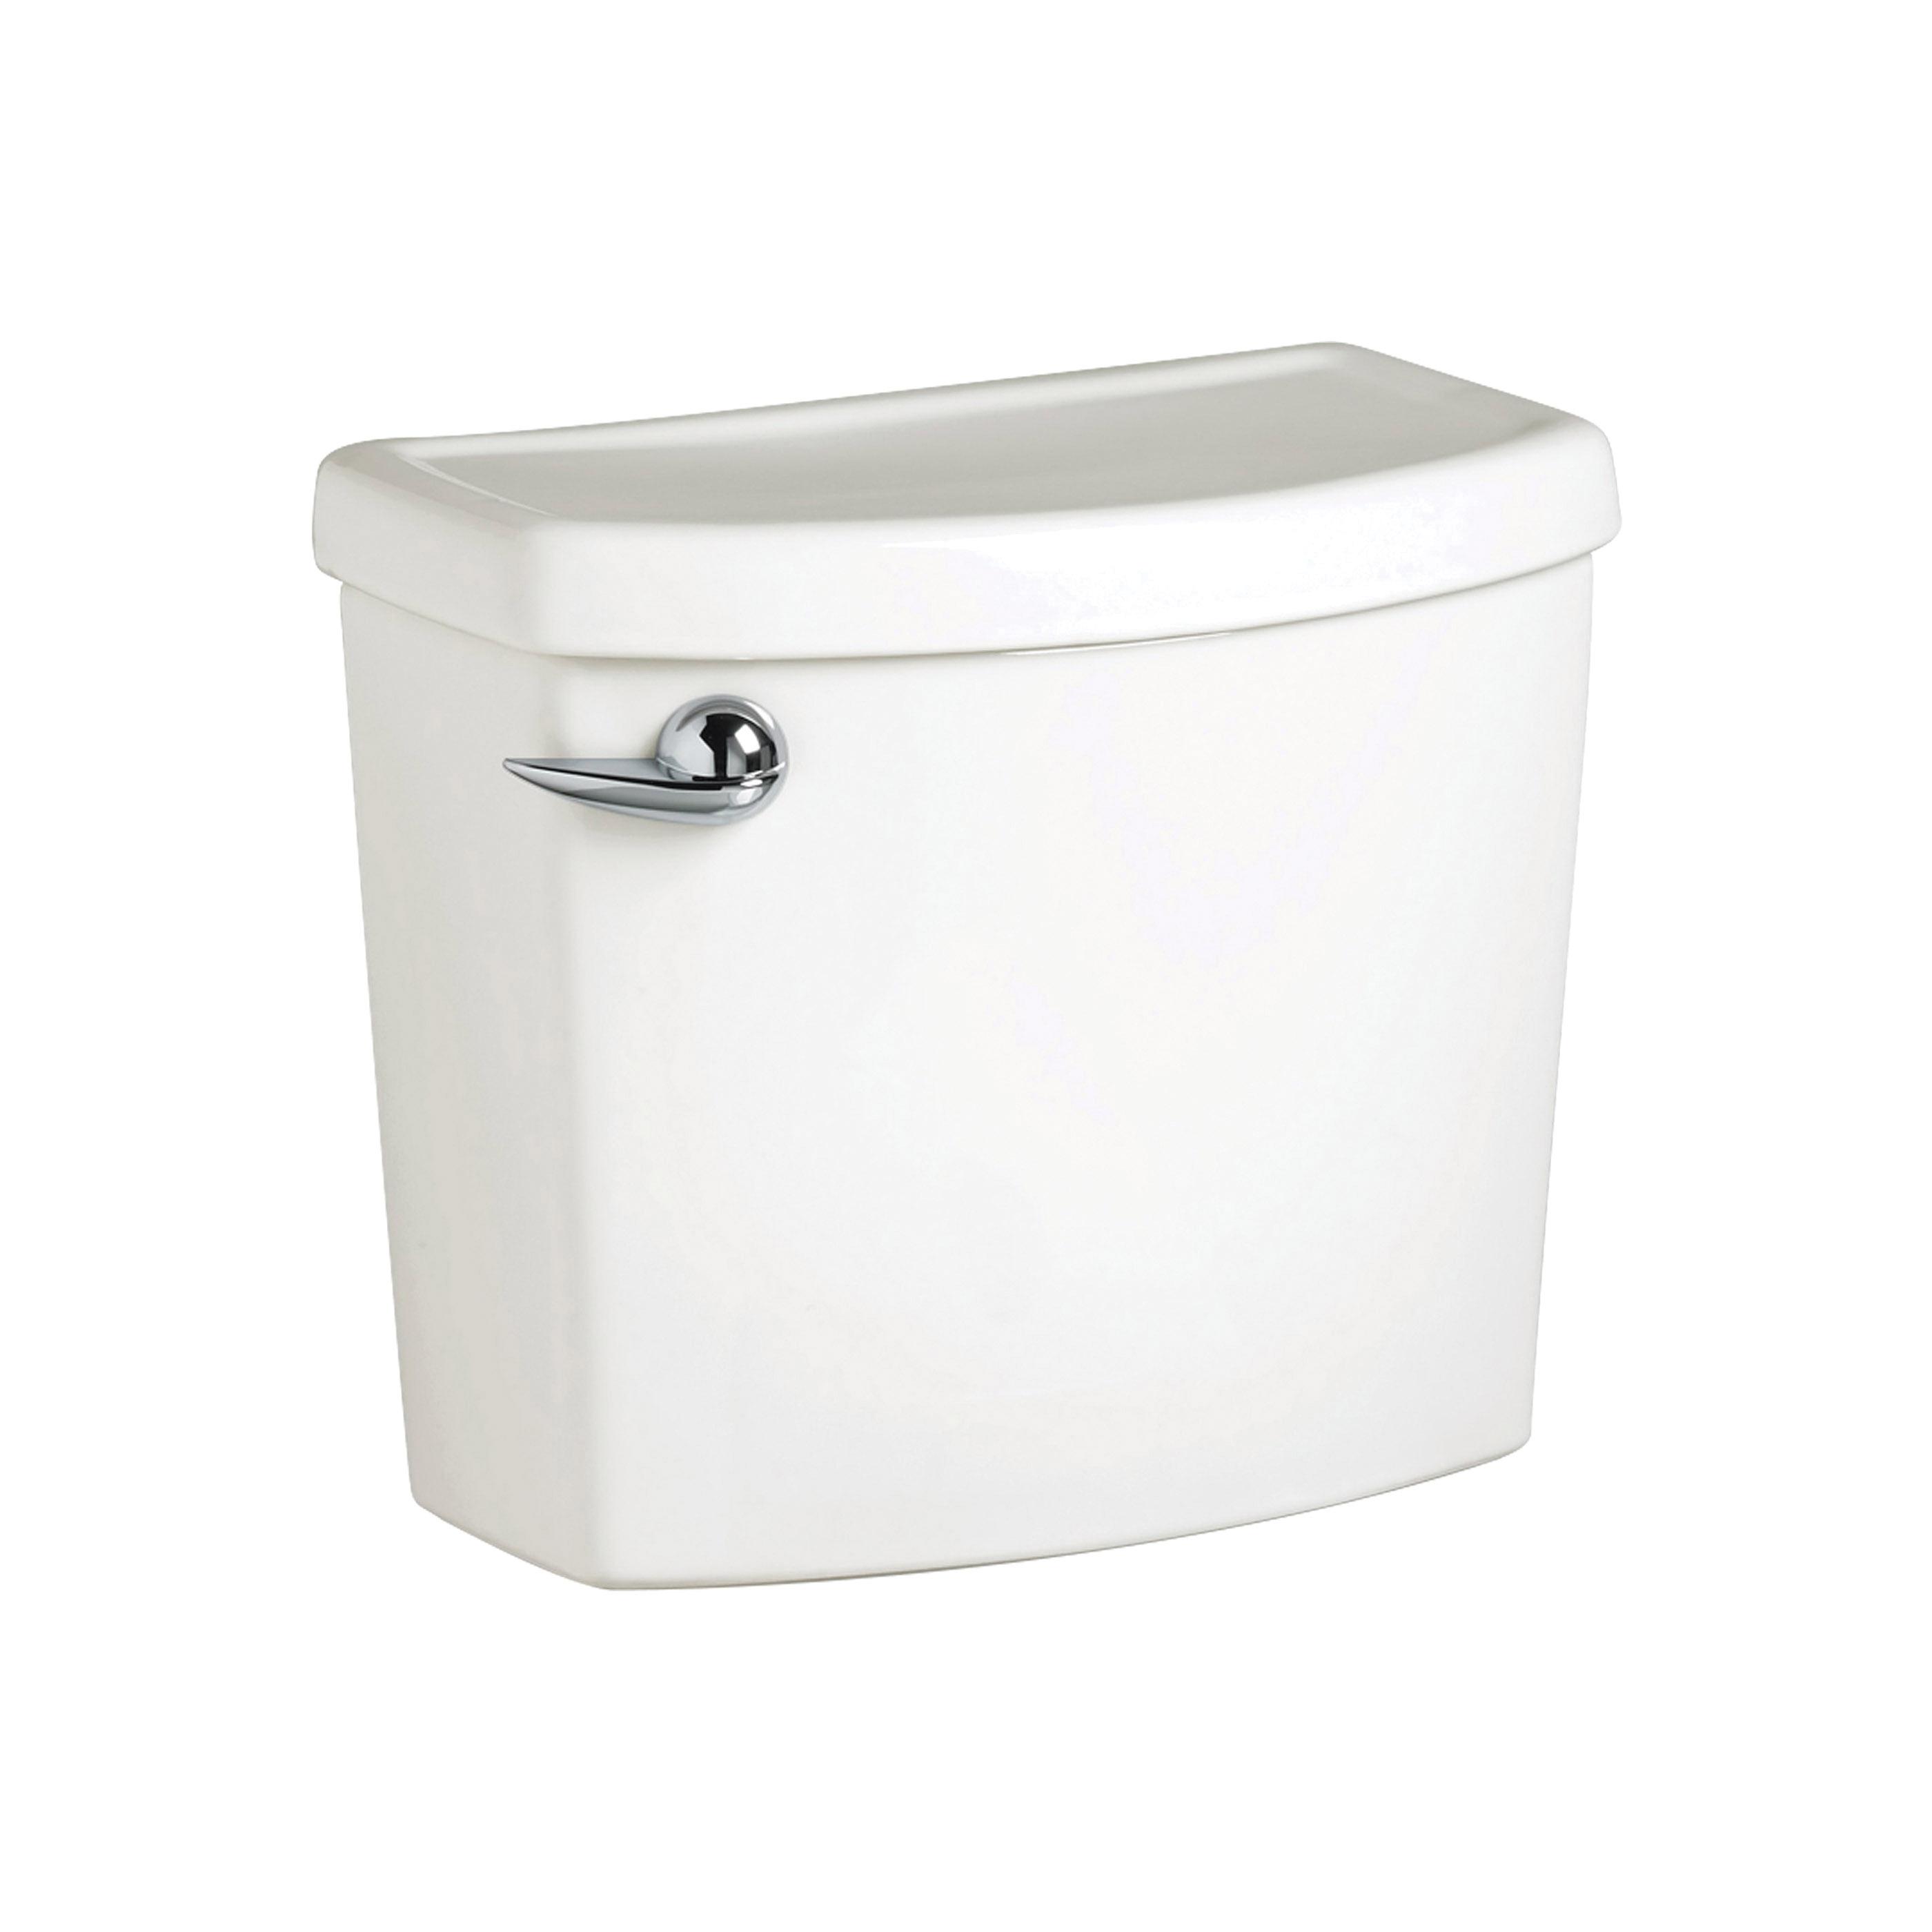 American Standard 4000.101.020 Toilet Tank, Cadet® 3 FloWise®, 1.28 gpf, 3 in Flush, White, Import